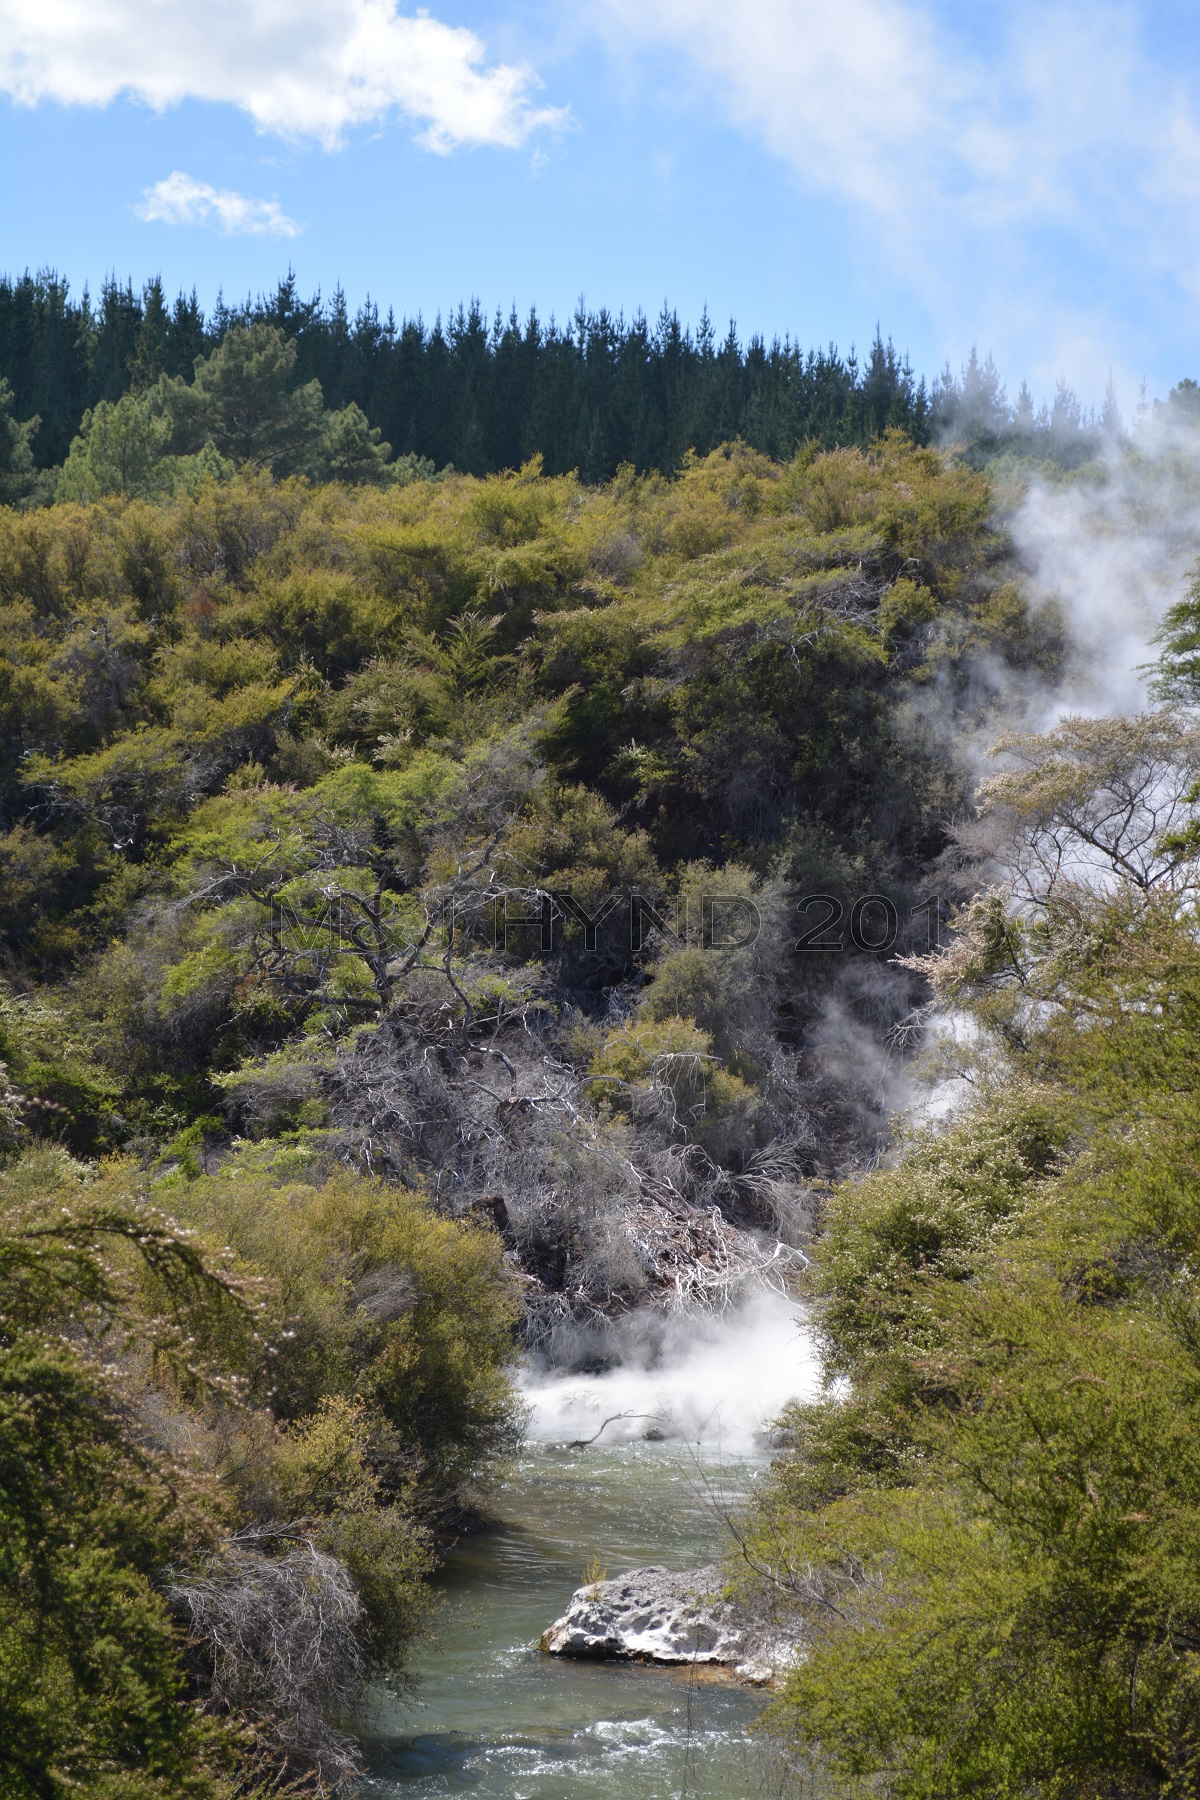 Bush walk stream+steam, Wai-o-tapu Thermal Wonderland, Rotorua, NZ